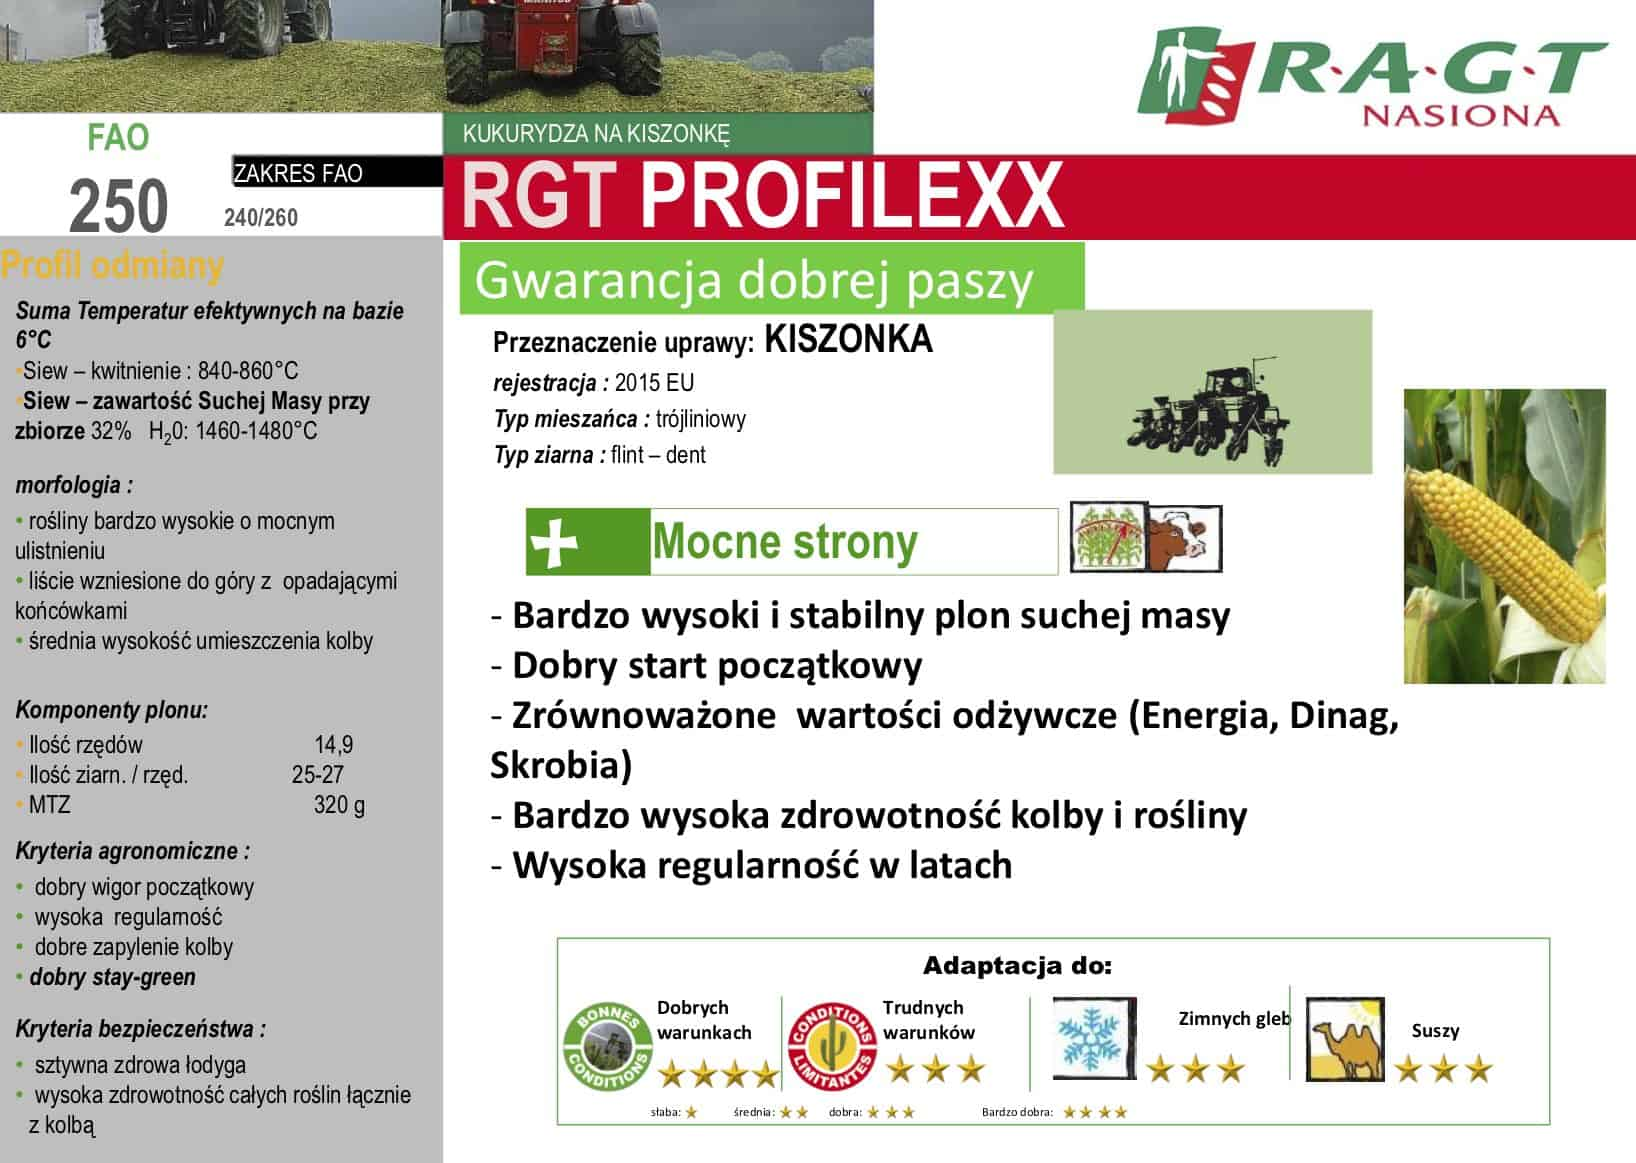 RGT Profilexx